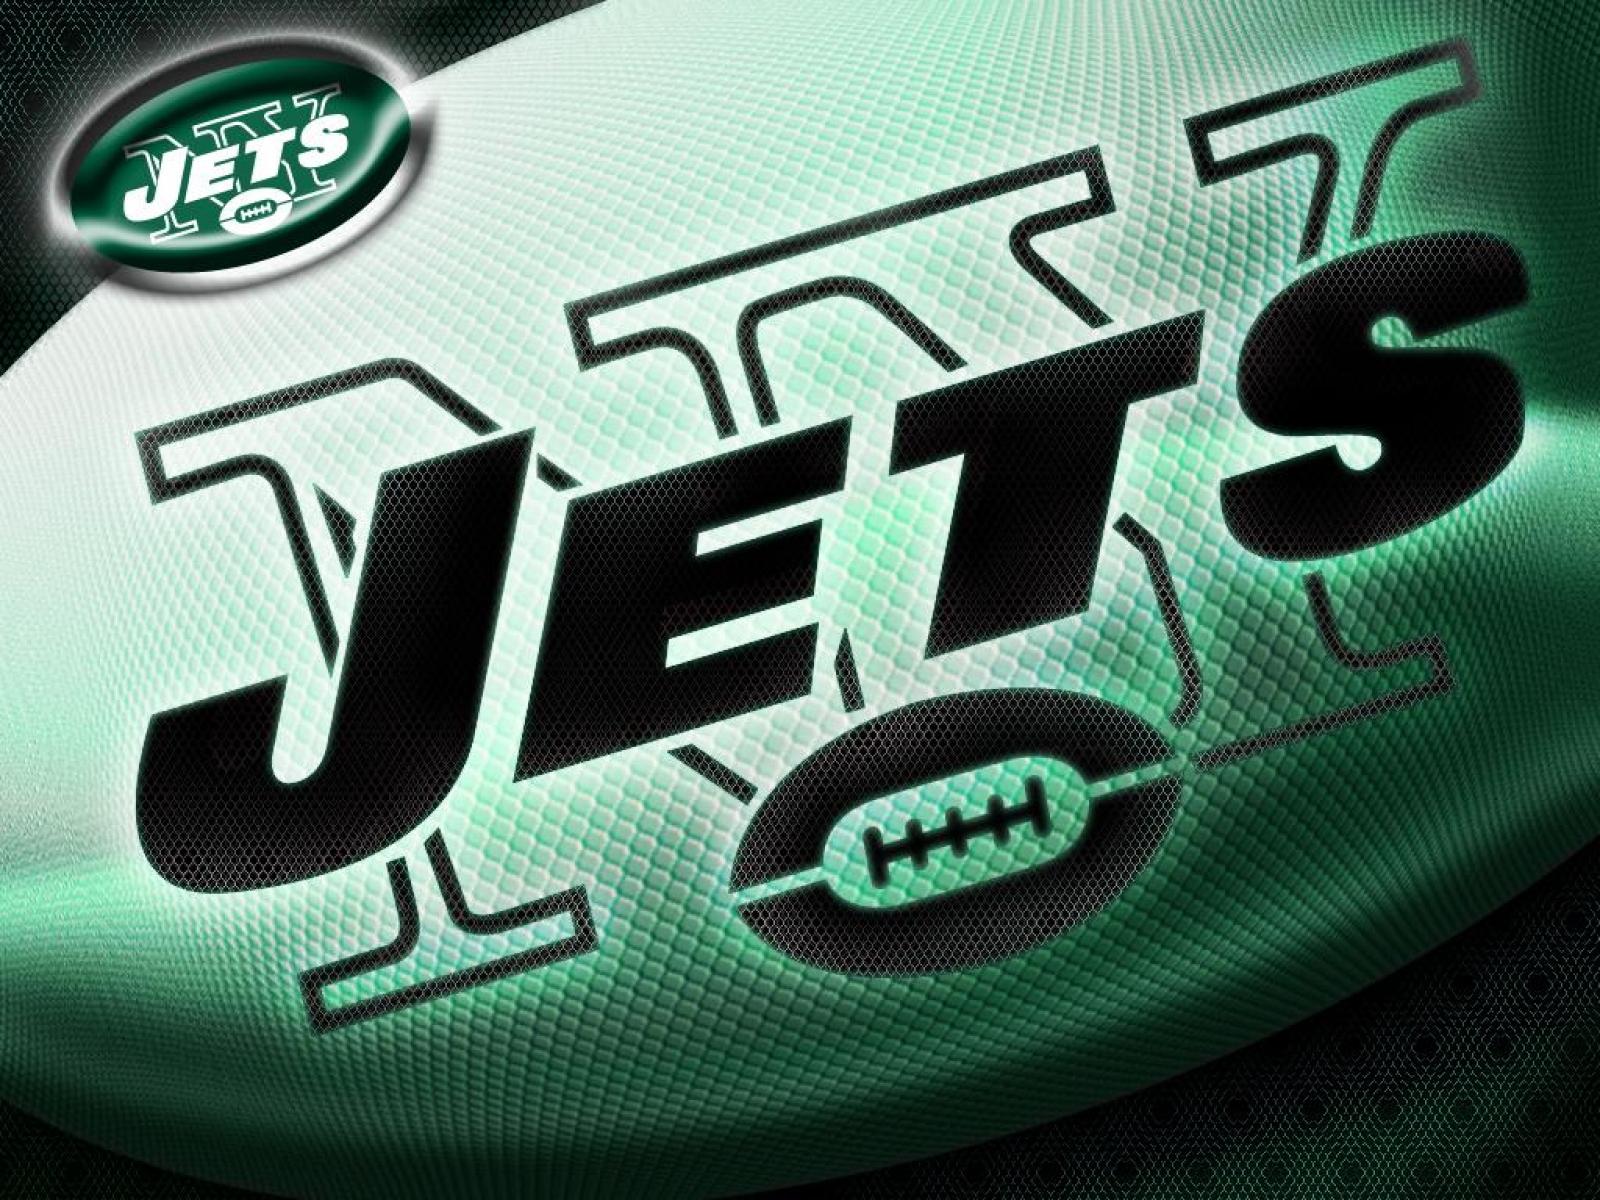 New York Jets Wallpaper 1600x1200 73379